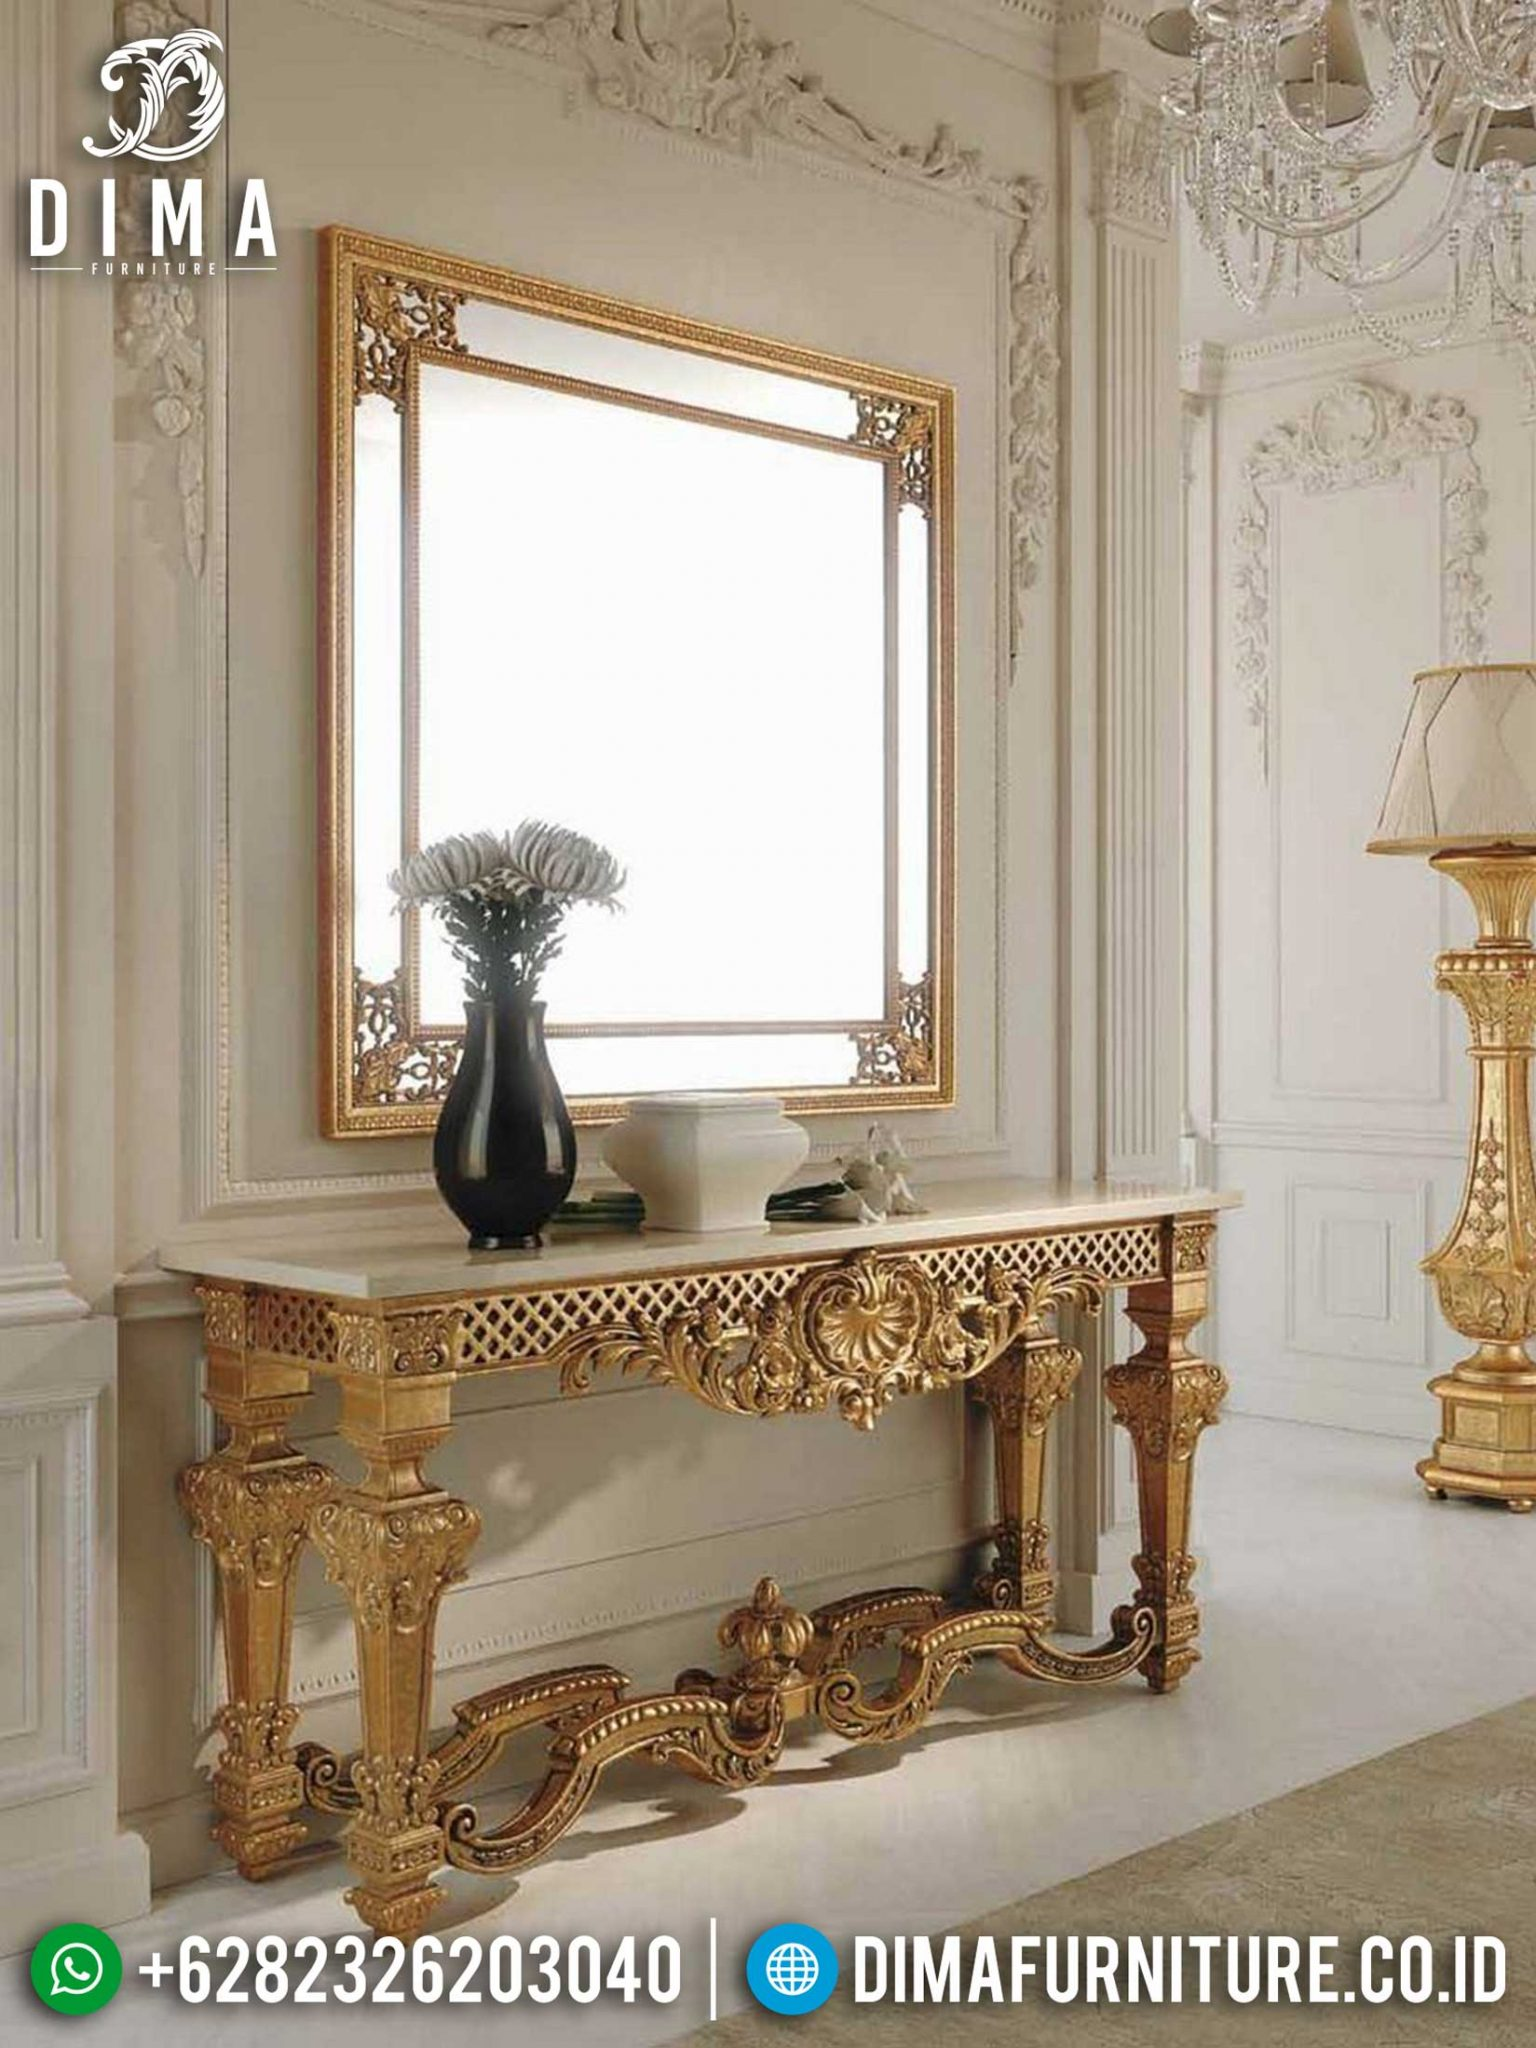 Classic Luxury Meja Konsol Mewah Ukir Jepara Golden Light Glossy New Mebel Jepara Mm-0804